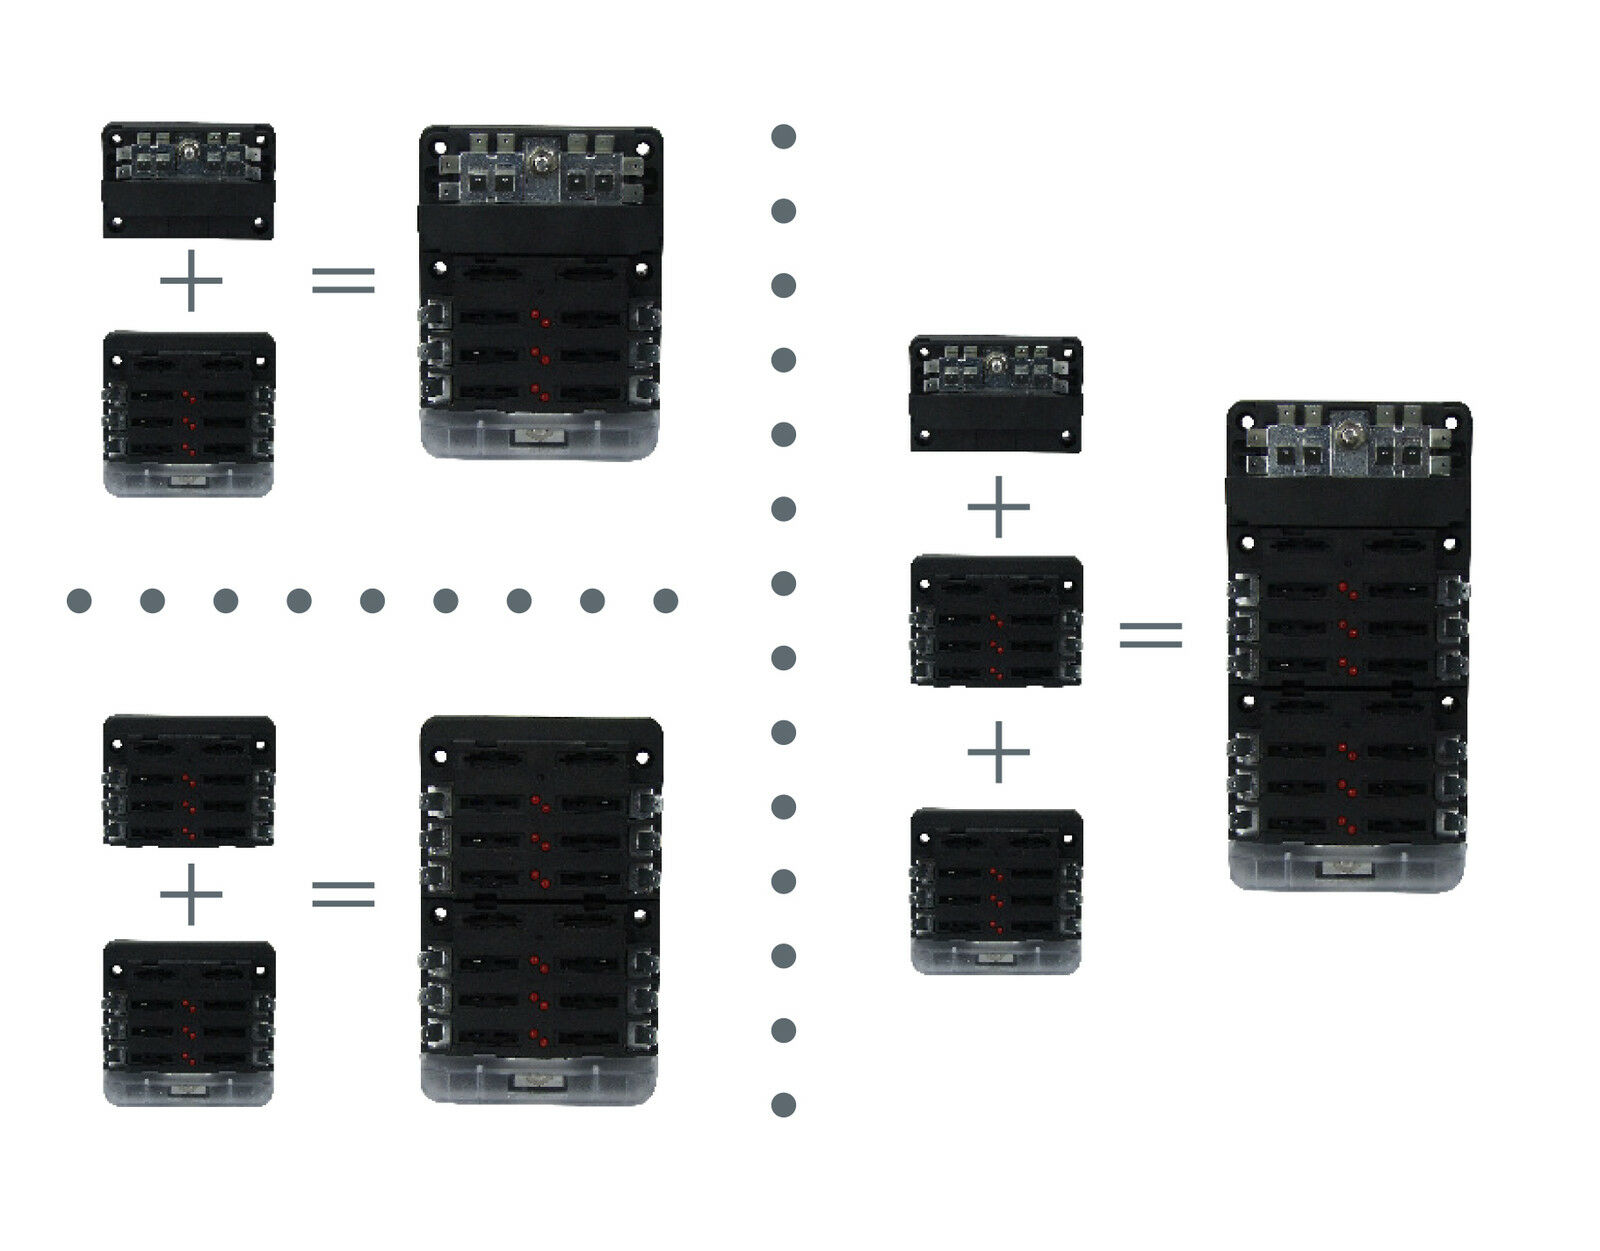 Circuit Fuse Box 6 Way 12 Volt Or 24 Volt 100 Amp Modular Design Blade Fuse